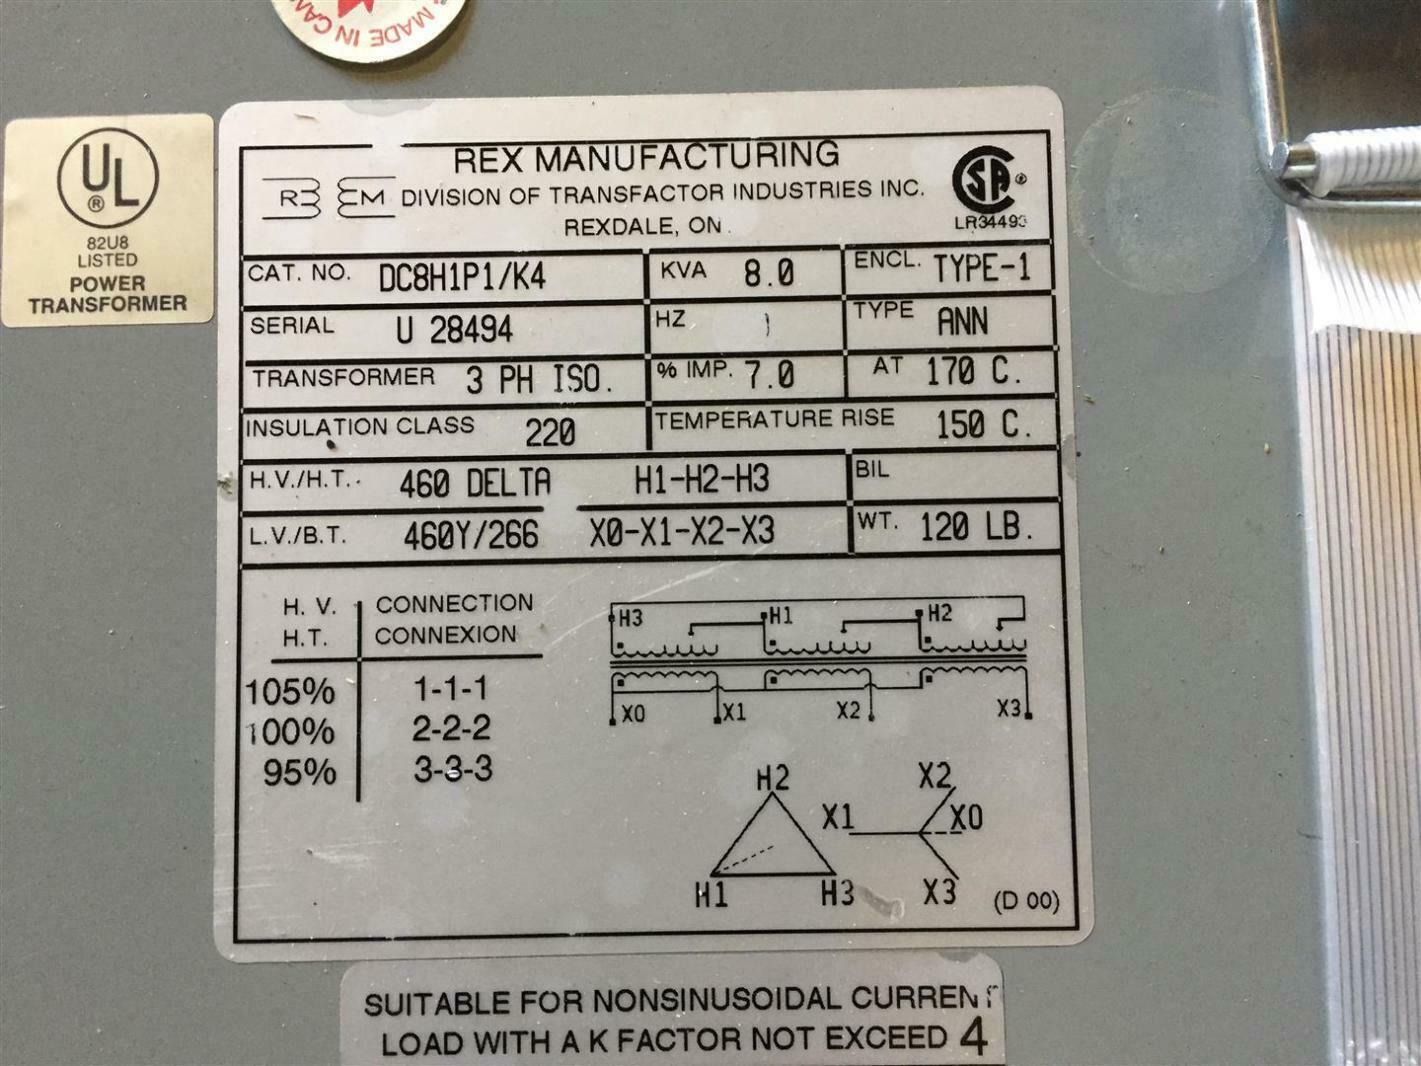 hight resolution of rex wiring diagram wiring libraryrex power 8kva 460v 3ph 60hz isolation transformer